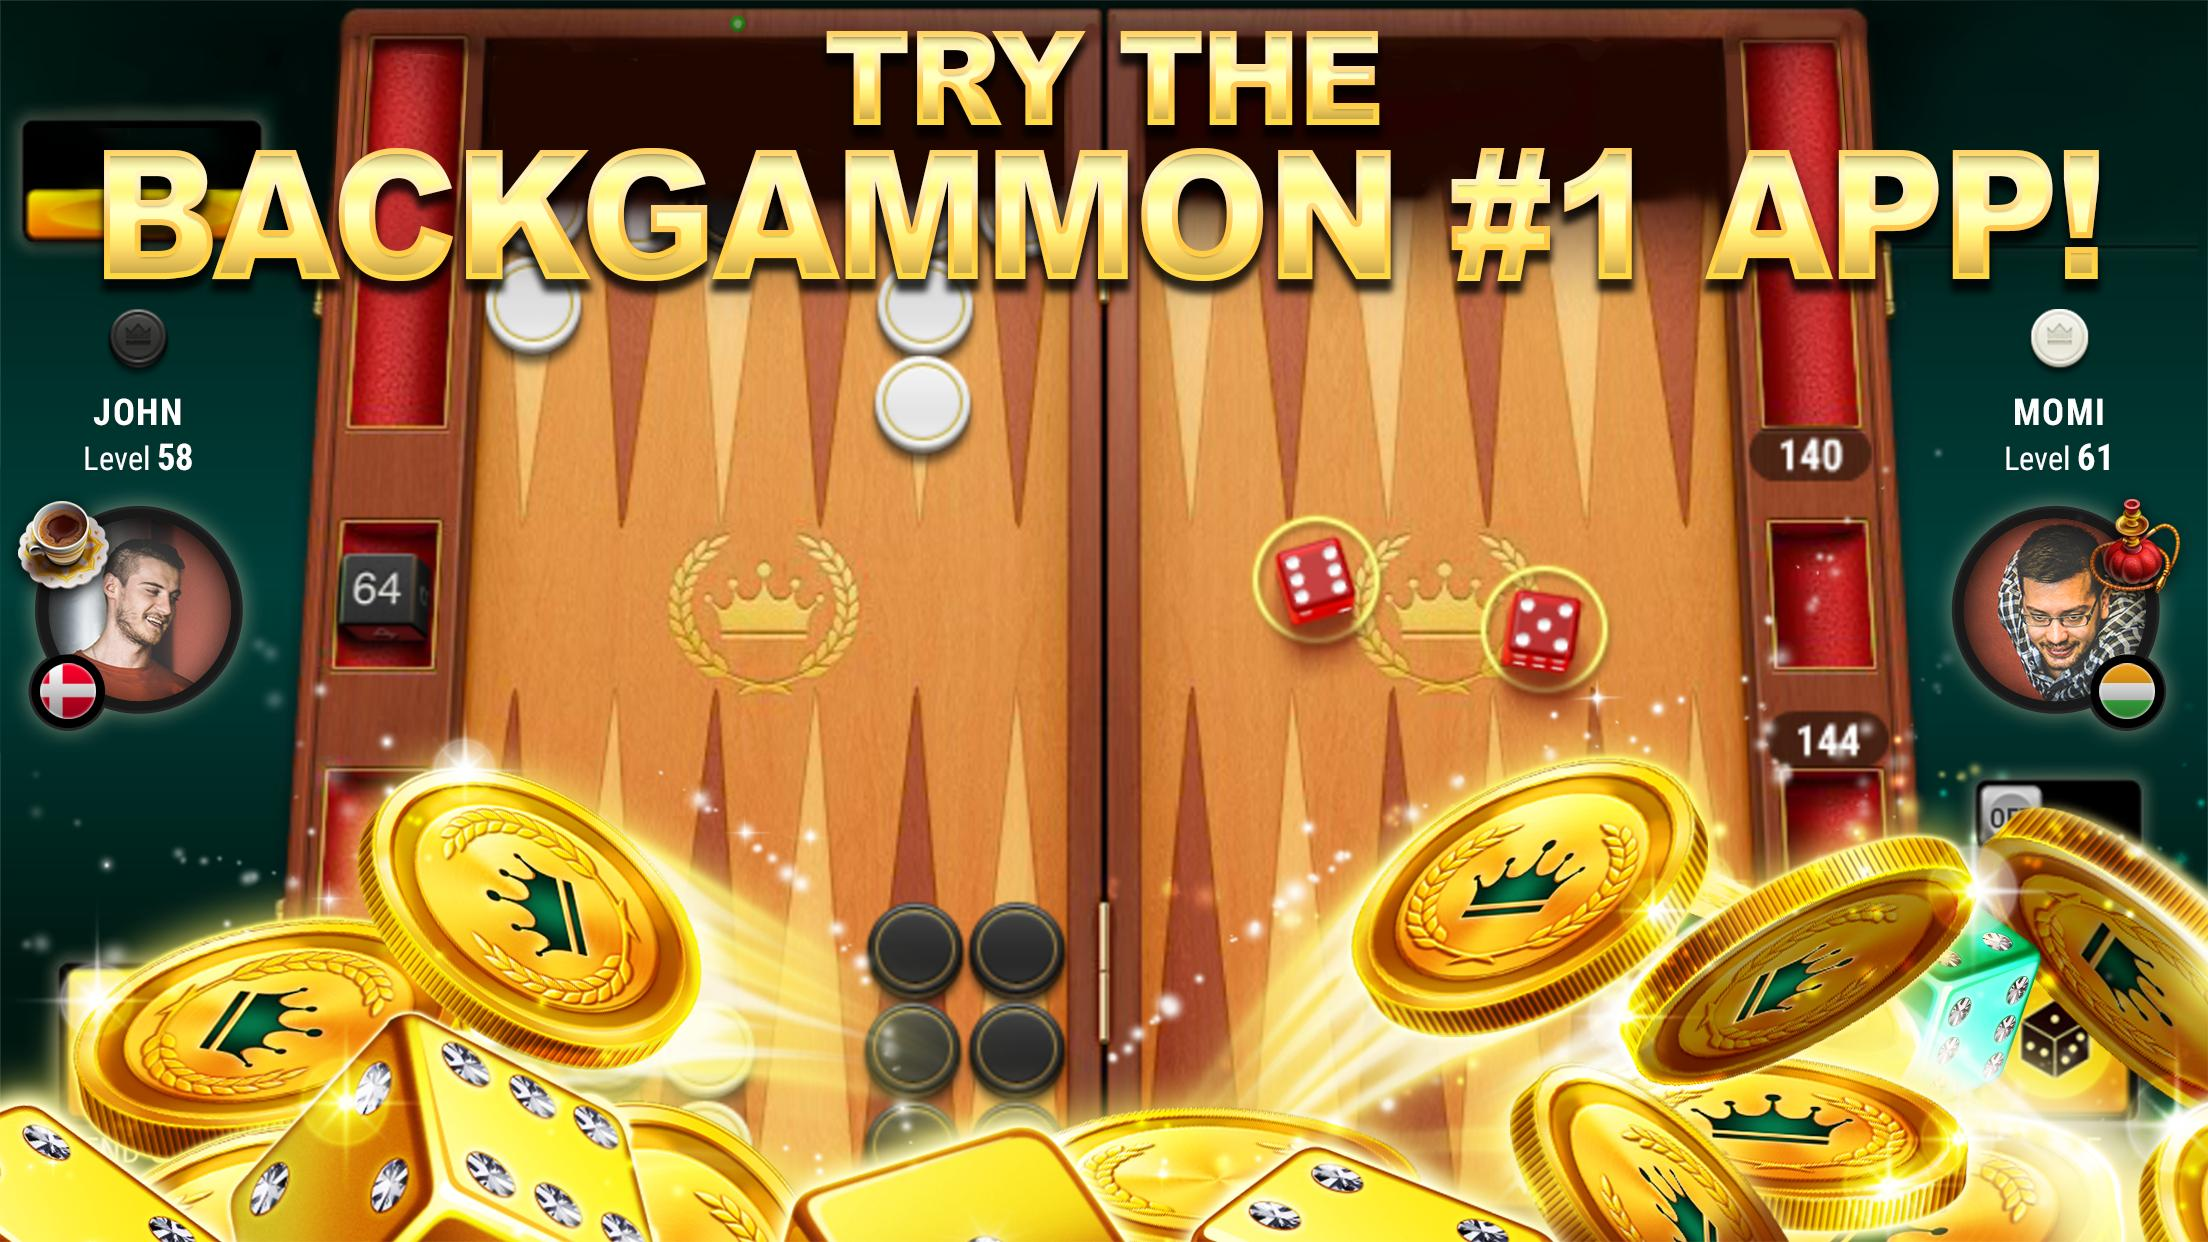 Backgammon Live - Play Online Free Backgammon 3.5.245 Screenshot 9